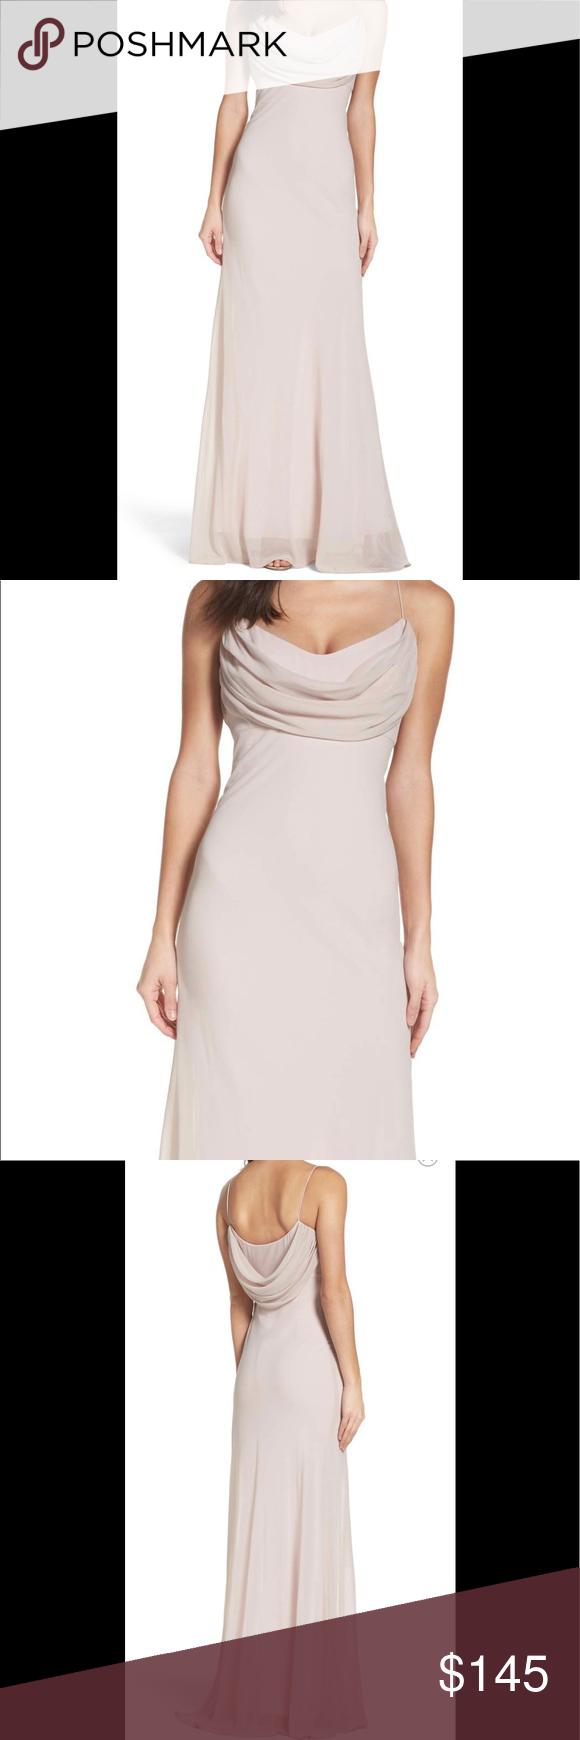 6b6b88eb02ccb Katie May Eden chiffon drape gown Sz 4 NWT grey Elegantly draped and  minimal in design